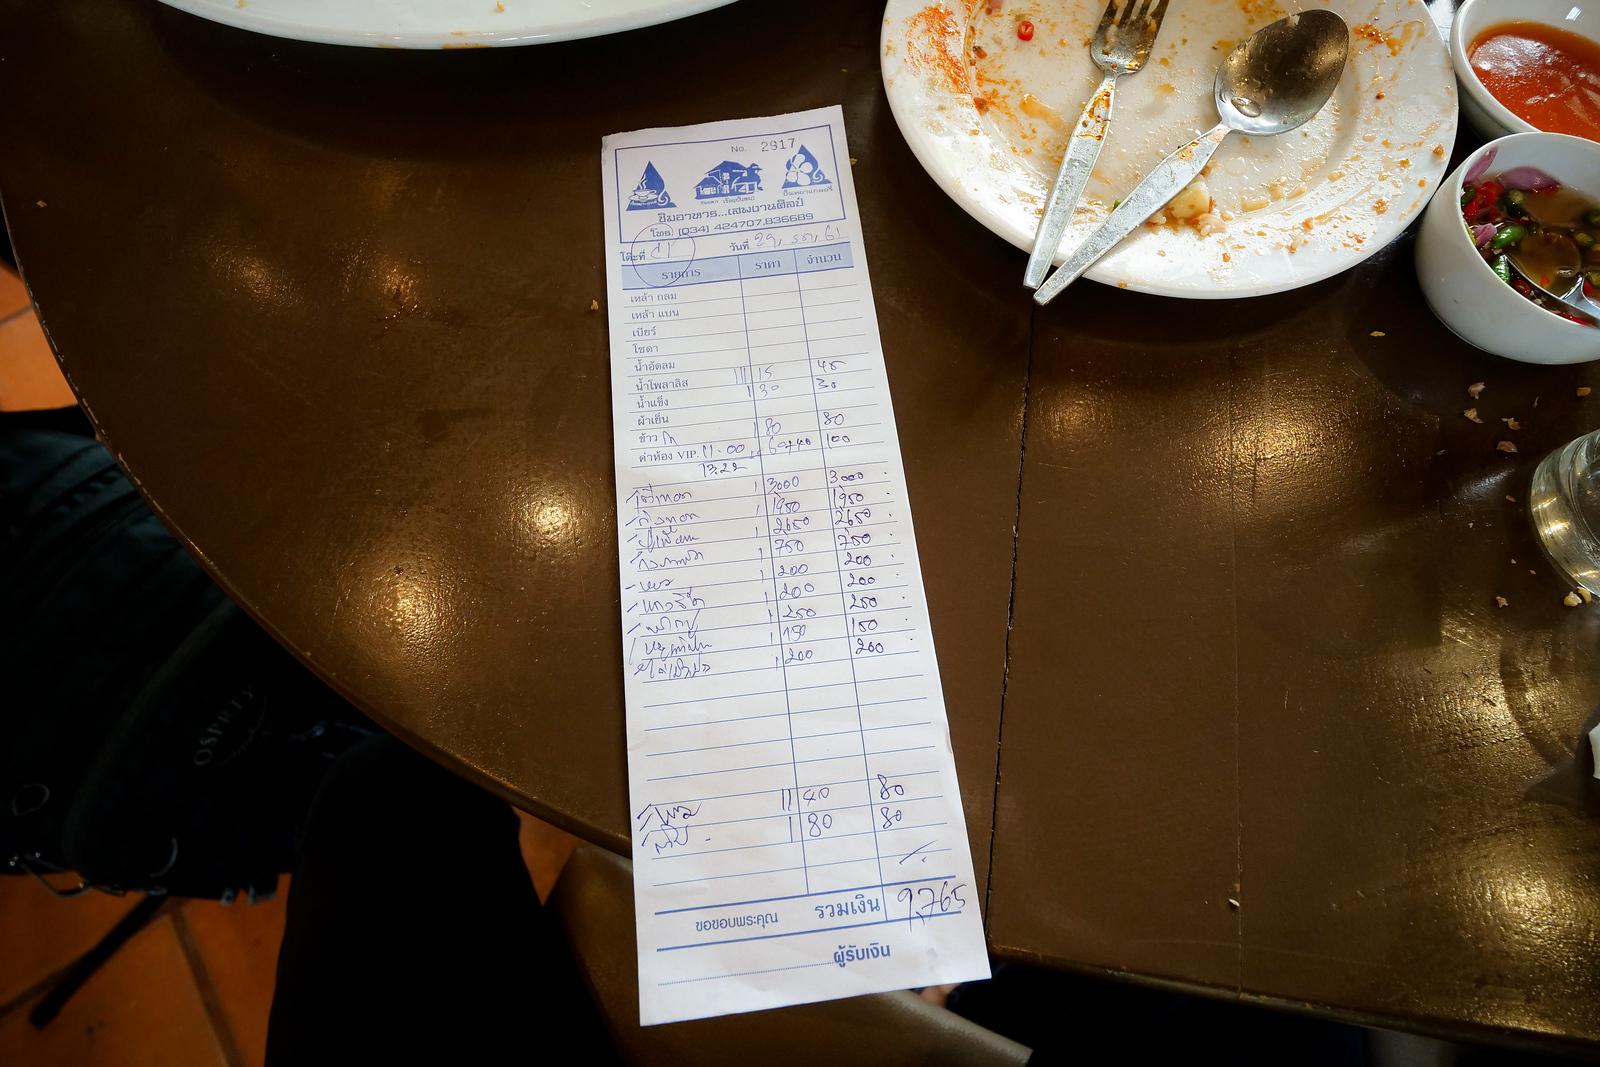 Thai Michelin Star restaurants review